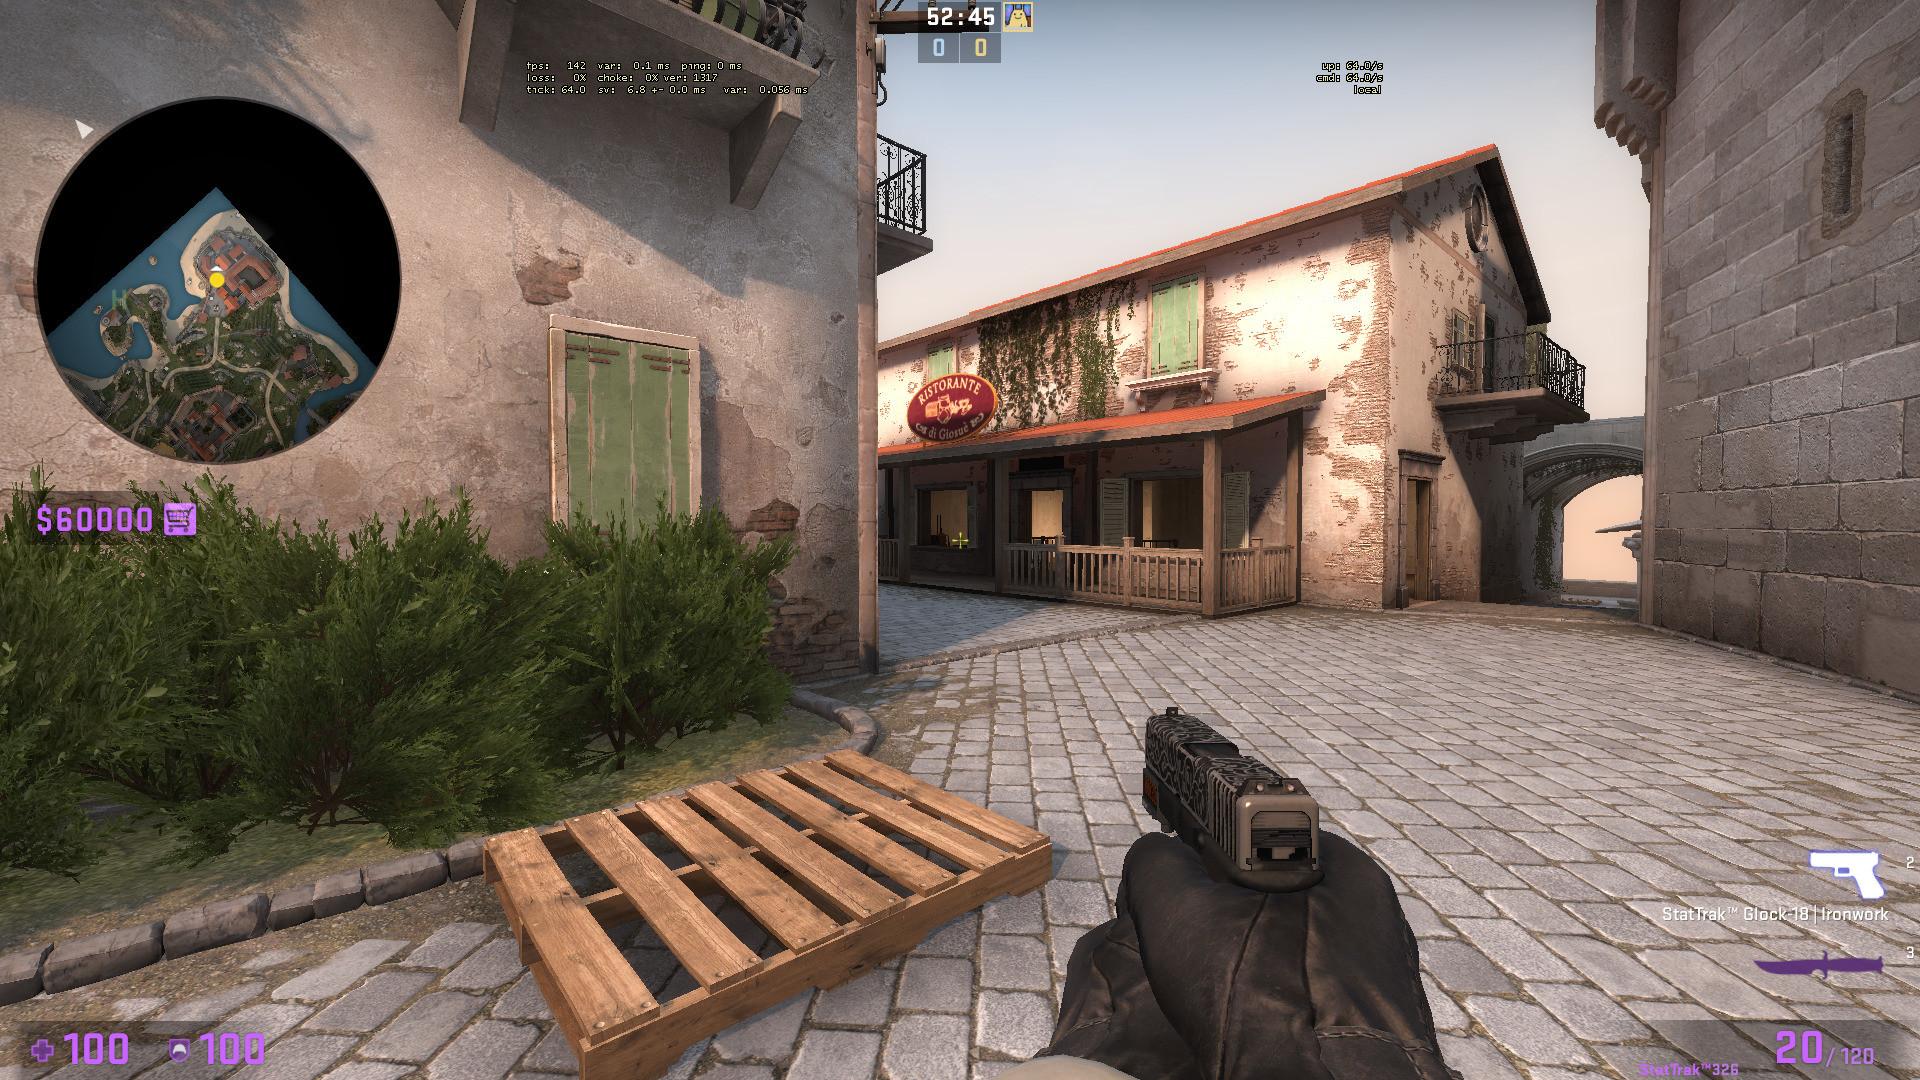 Counter-strike-Global-Offensive-Screenshot-2021_09.07-13_36_57_19.jpeg.5d0f8212ab1272a6b850be7c127ebb9c.jpeg